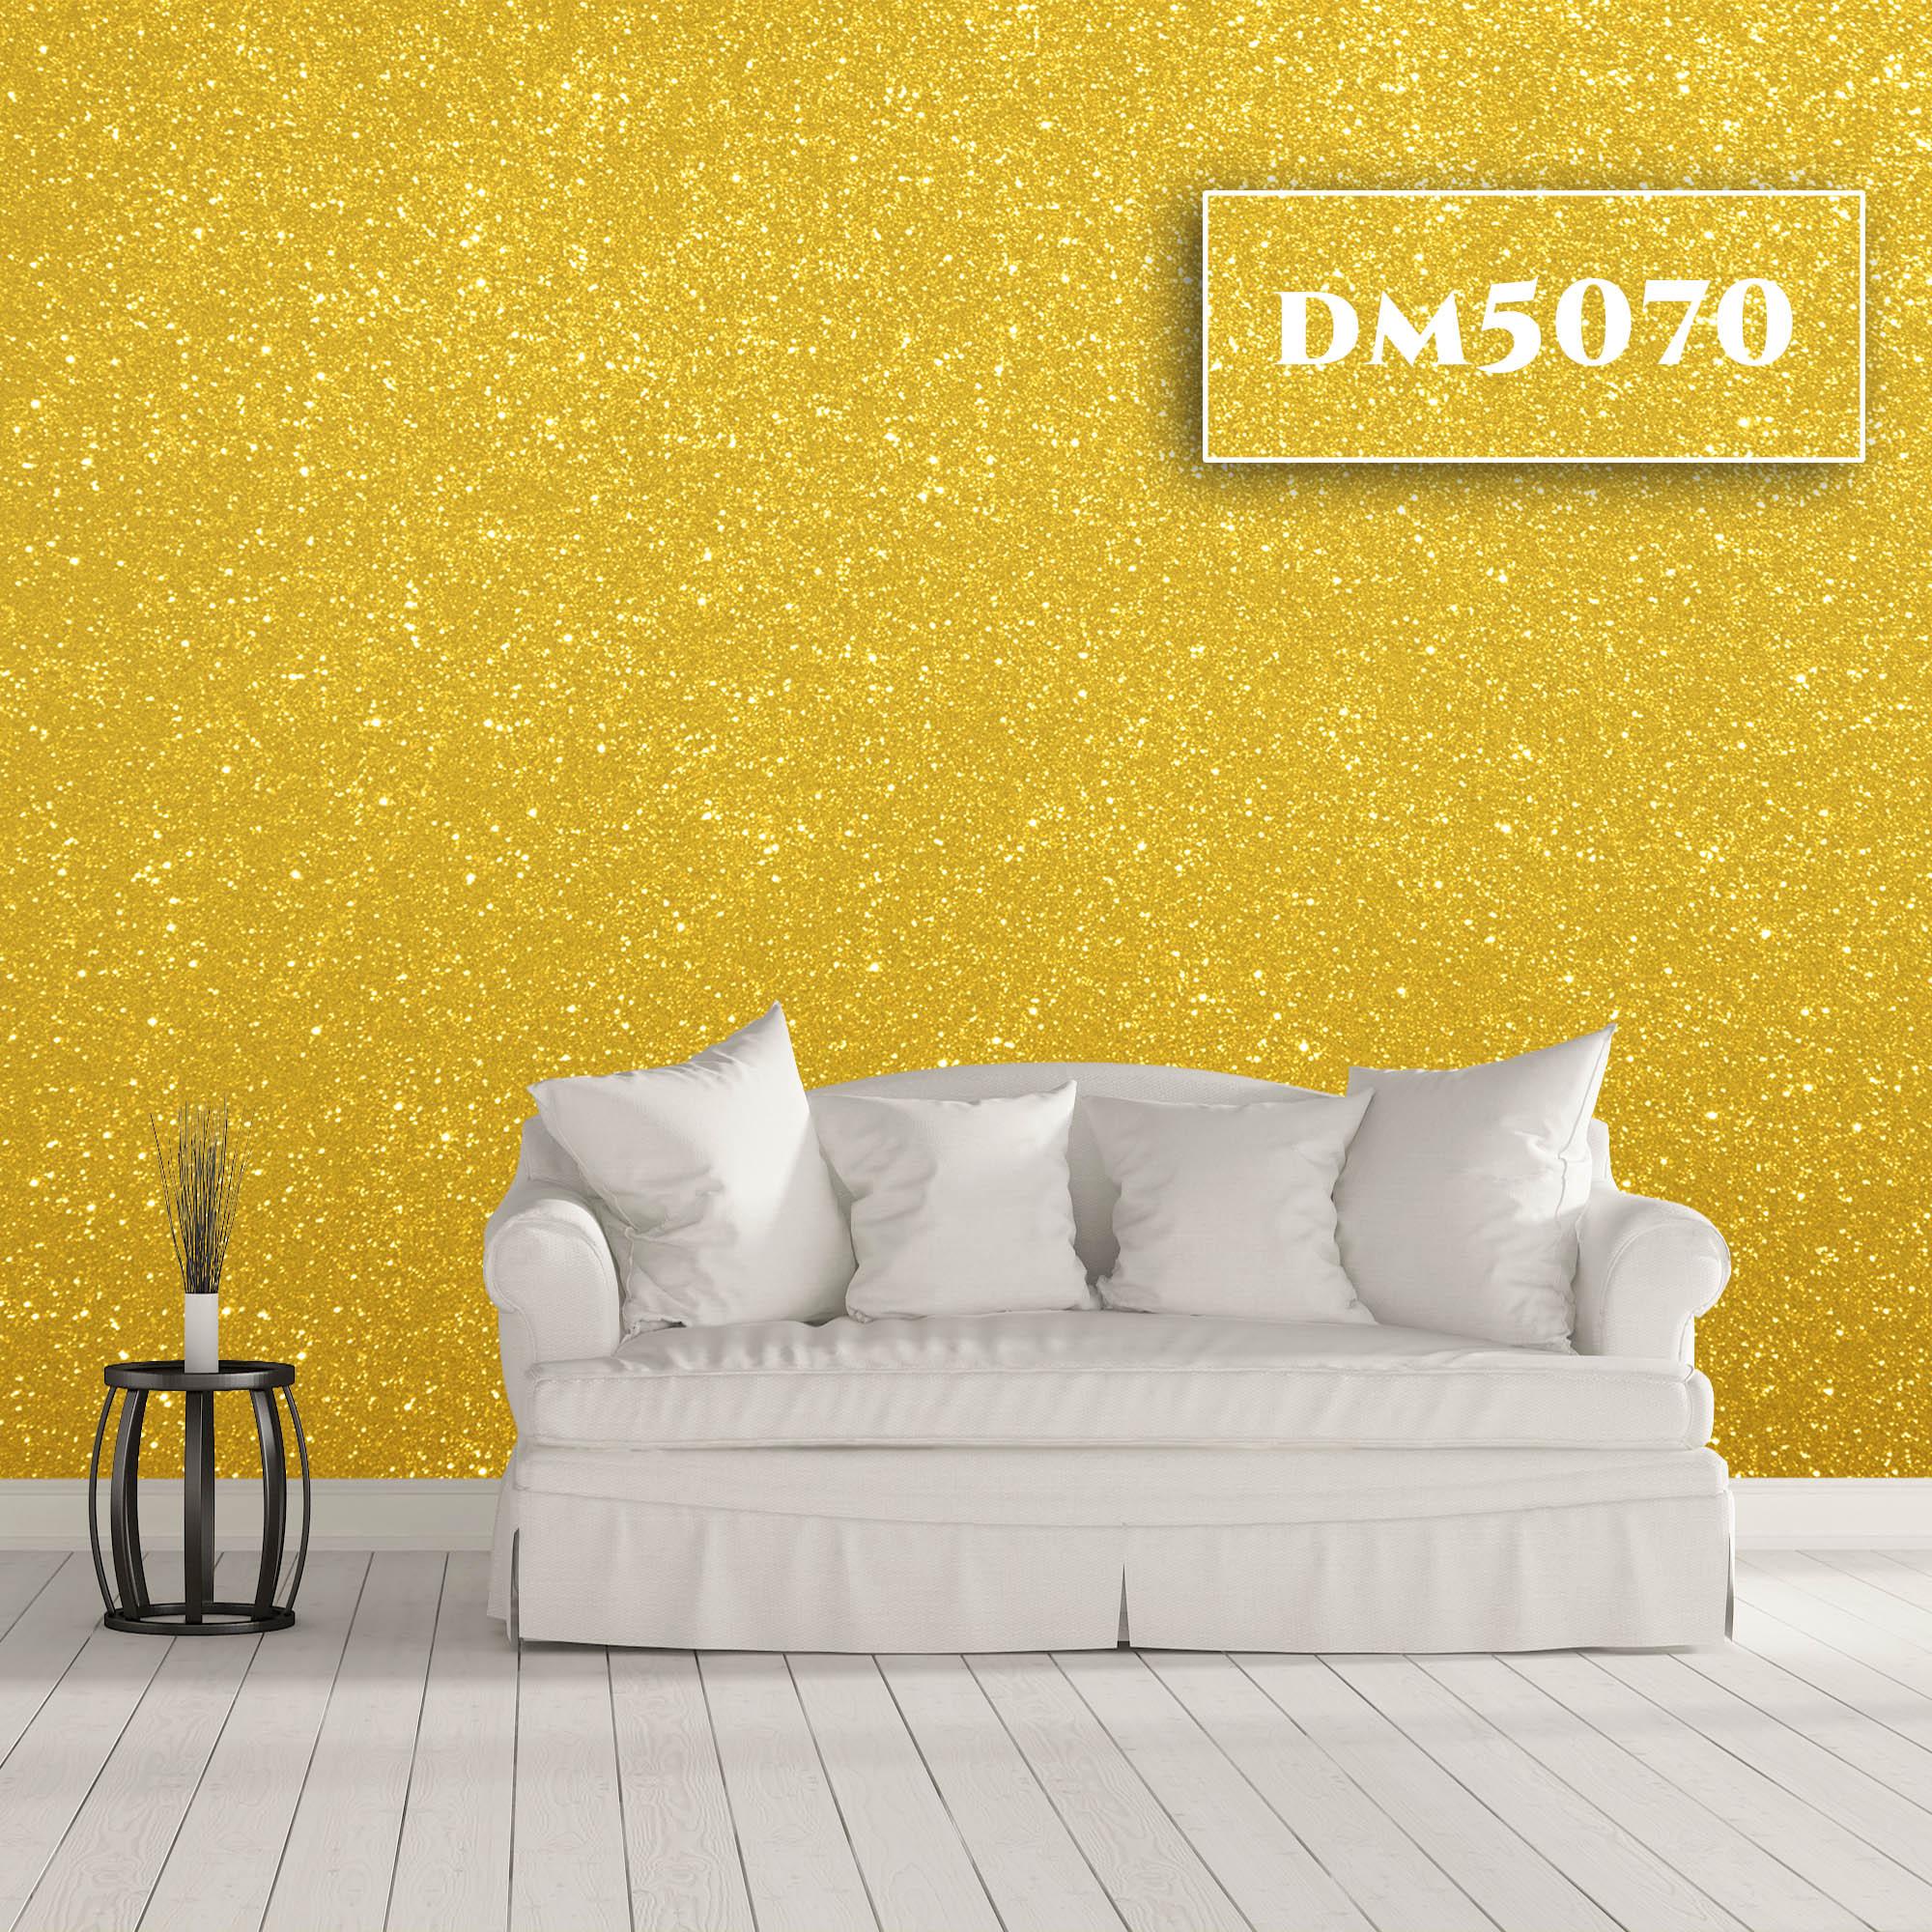 DM5070